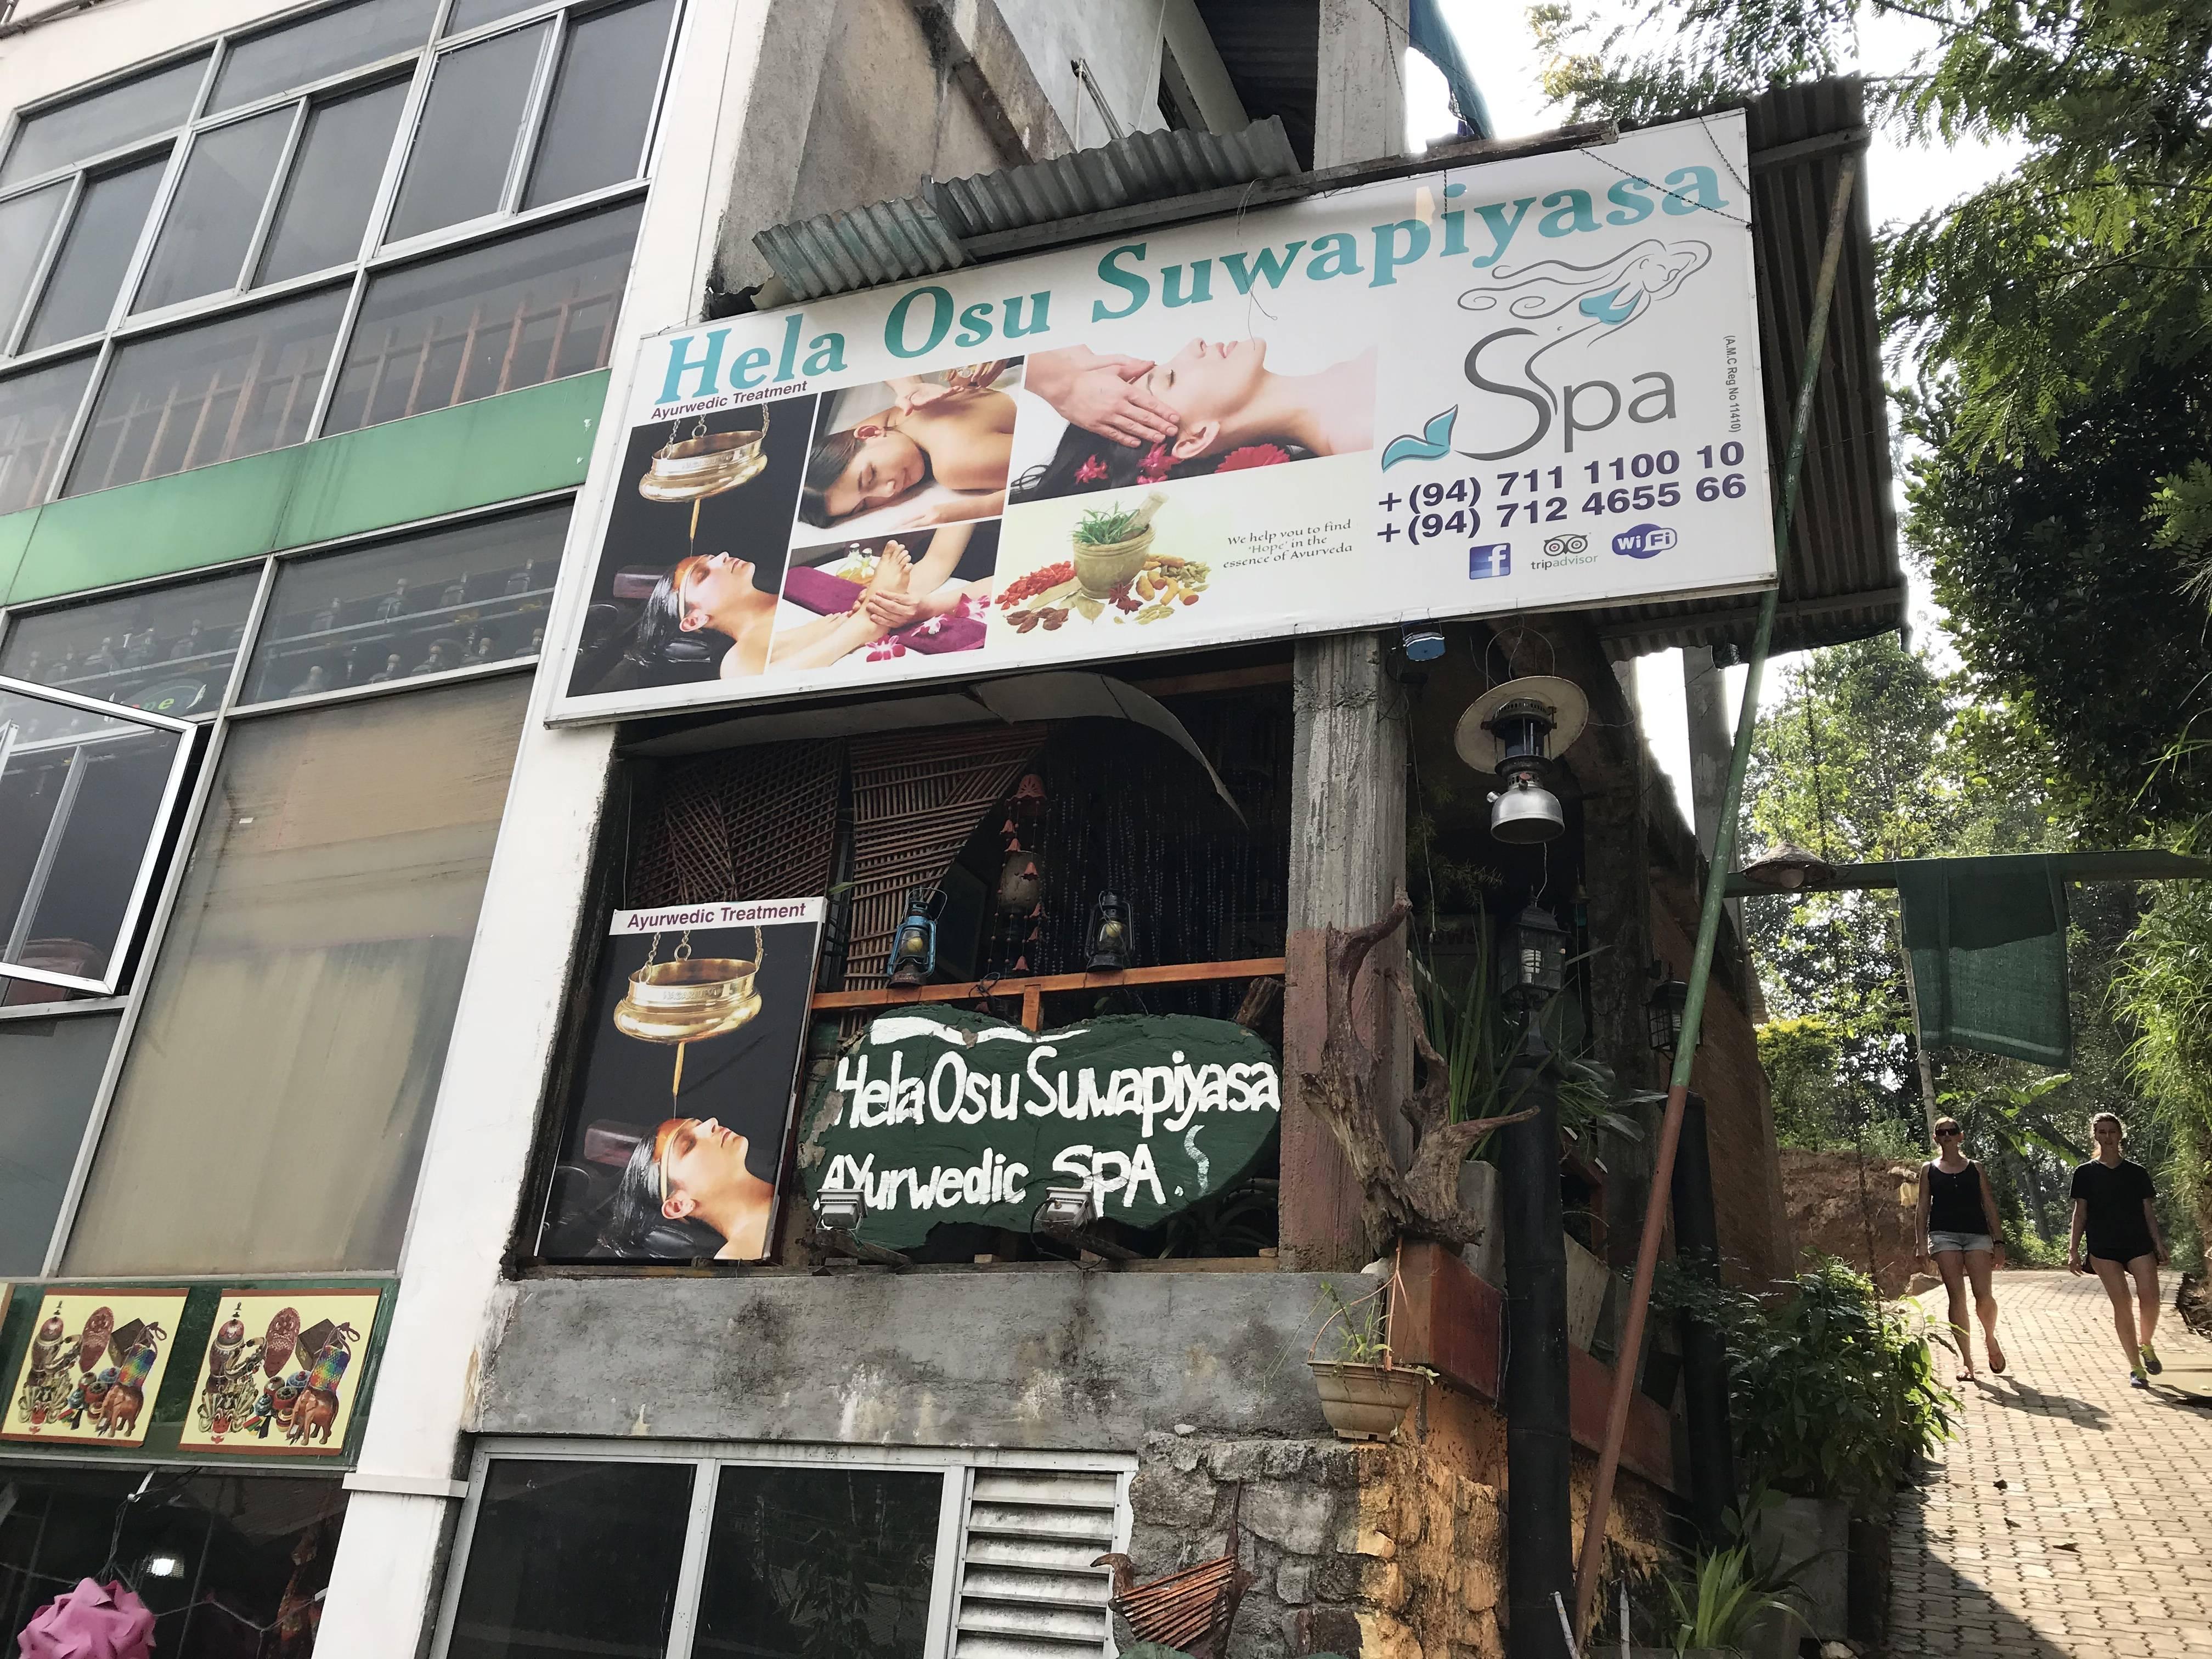 Photo 3: Hela Osu Suwapiyasa   massage ayurvedique